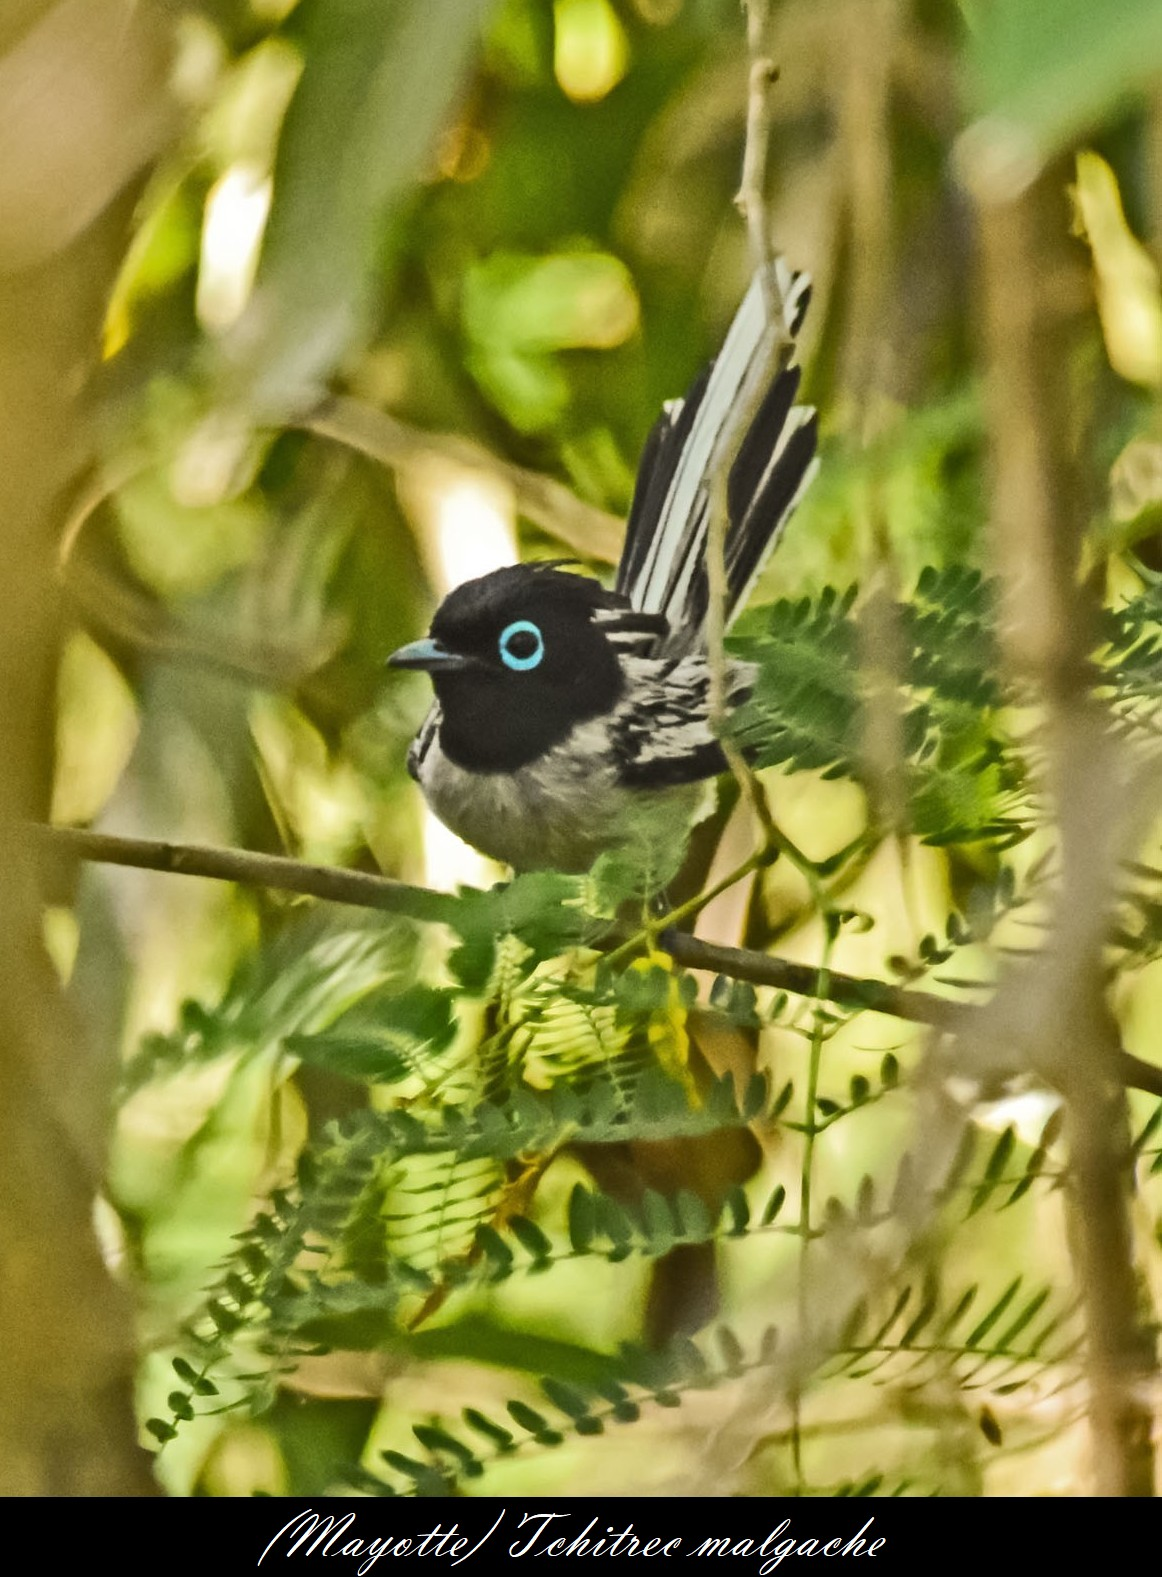 (Monarchidés) Tchitrec malgache  (Terpsiphone mutata)  (2)